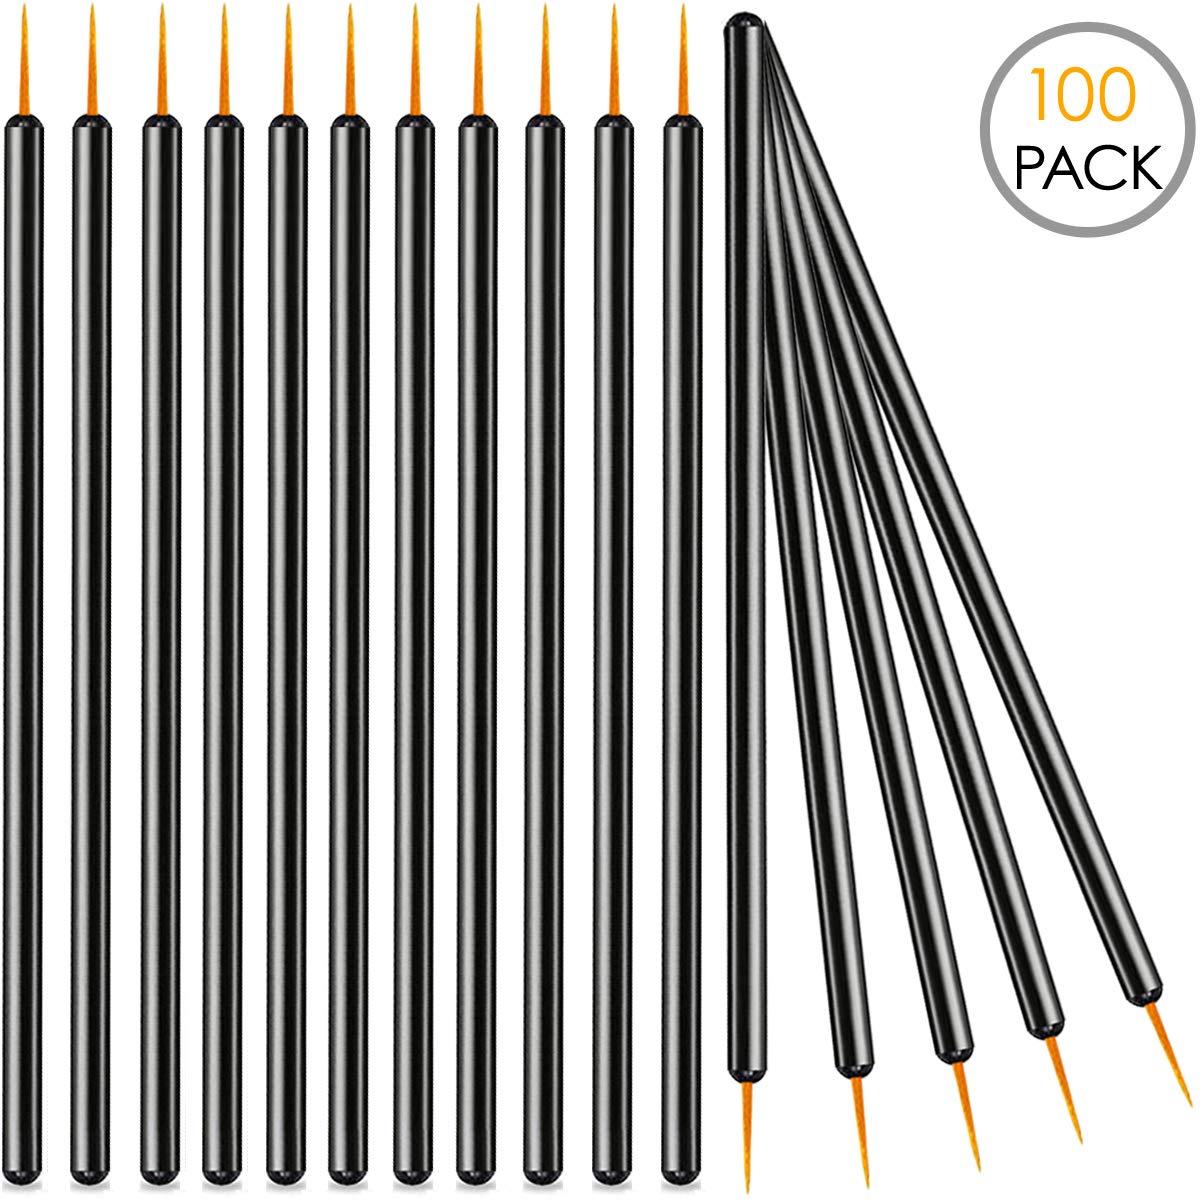 KINGMAS 100 Pack Disposable Eyeliner Brushes Applicator Makeup Eye Liner Wands